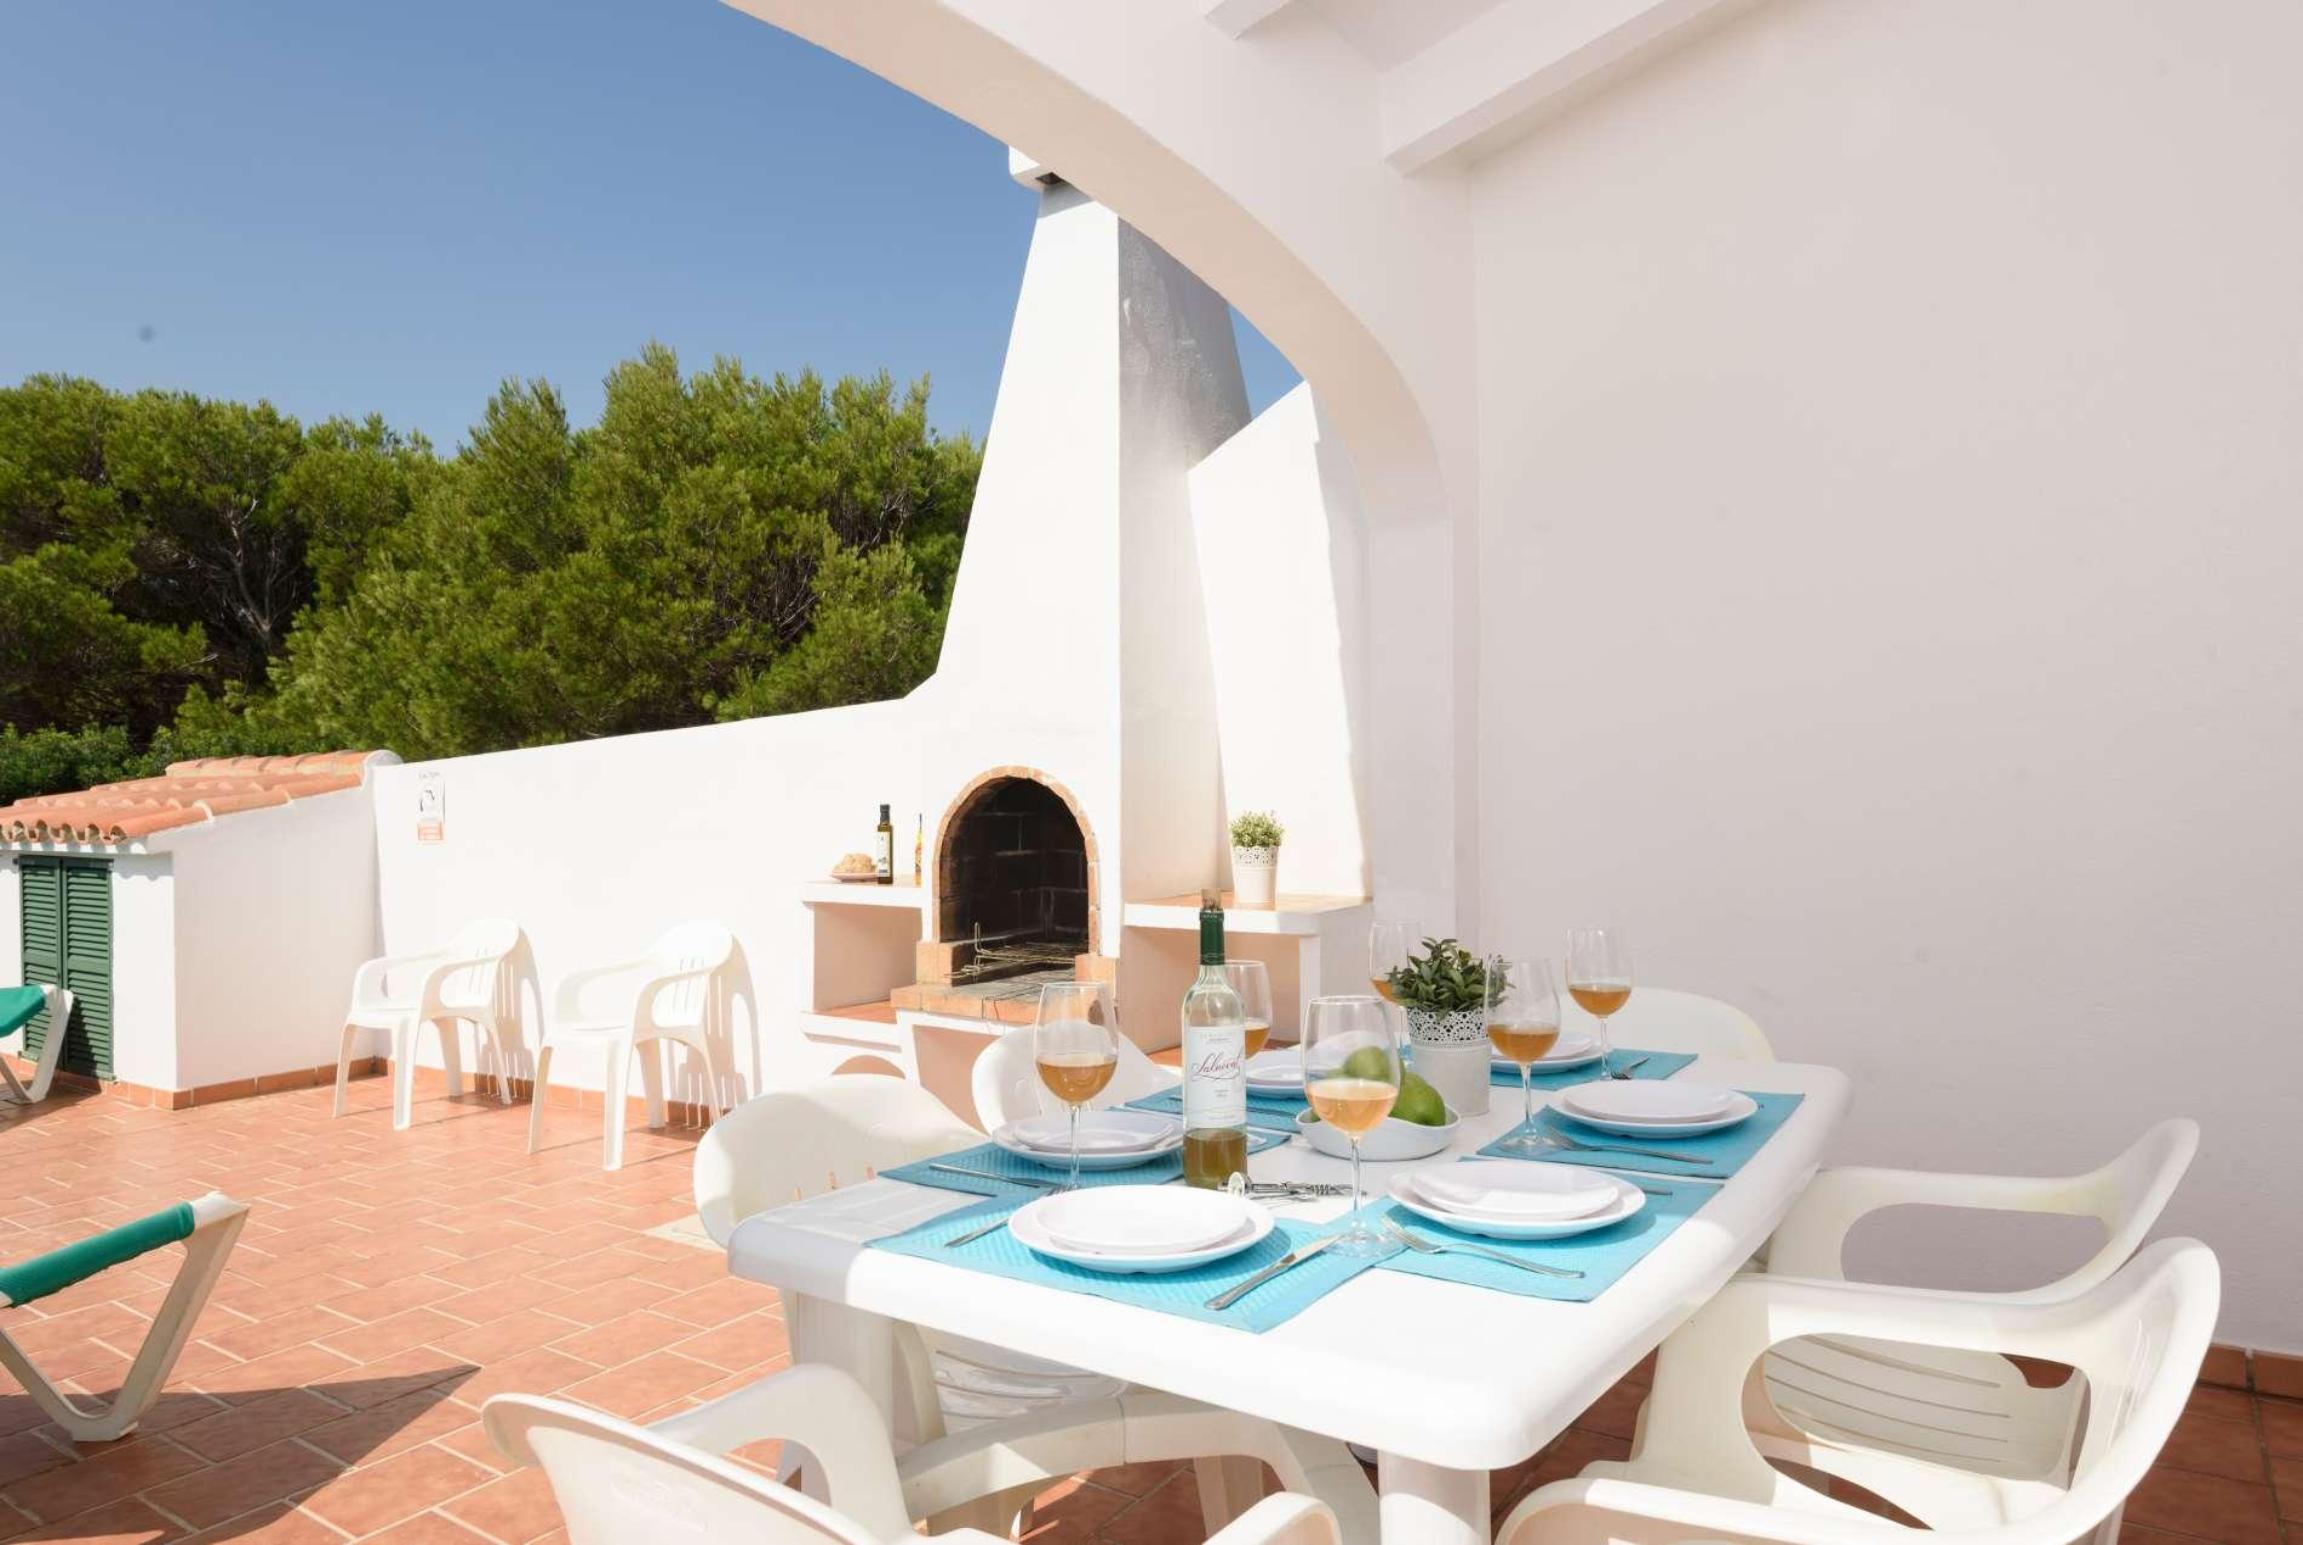 Ferienhaus Eulalia I (2653535), Arenal De'N Castell, Menorca, Balearische Inseln, Spanien, Bild 20